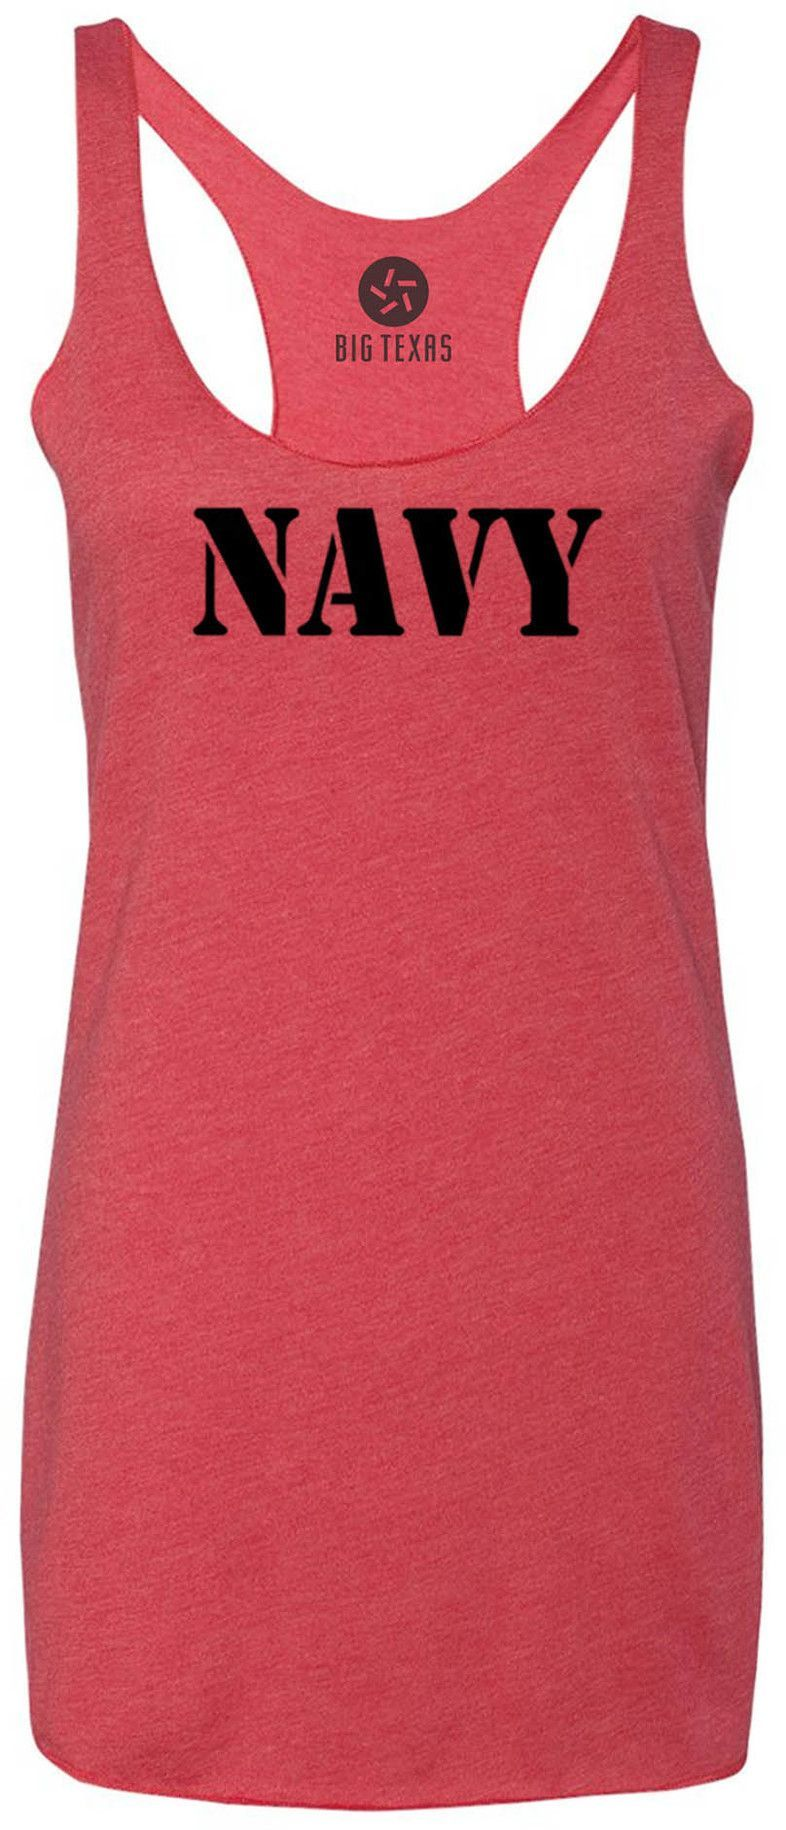 NAVY Stencil (Black) Tri-Blend Racerback Tank-Top